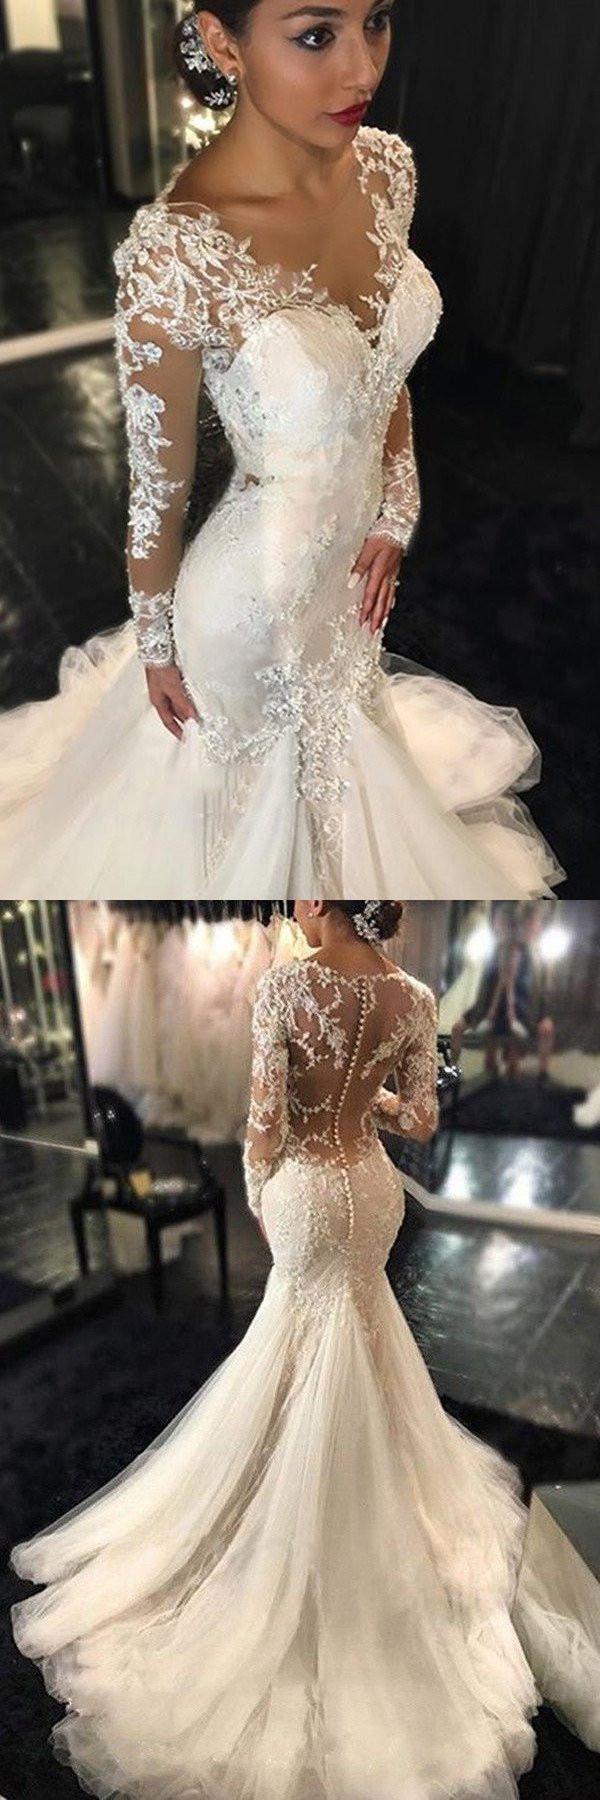 Long sleeve lace mermaid wedding dresses sexy see through long